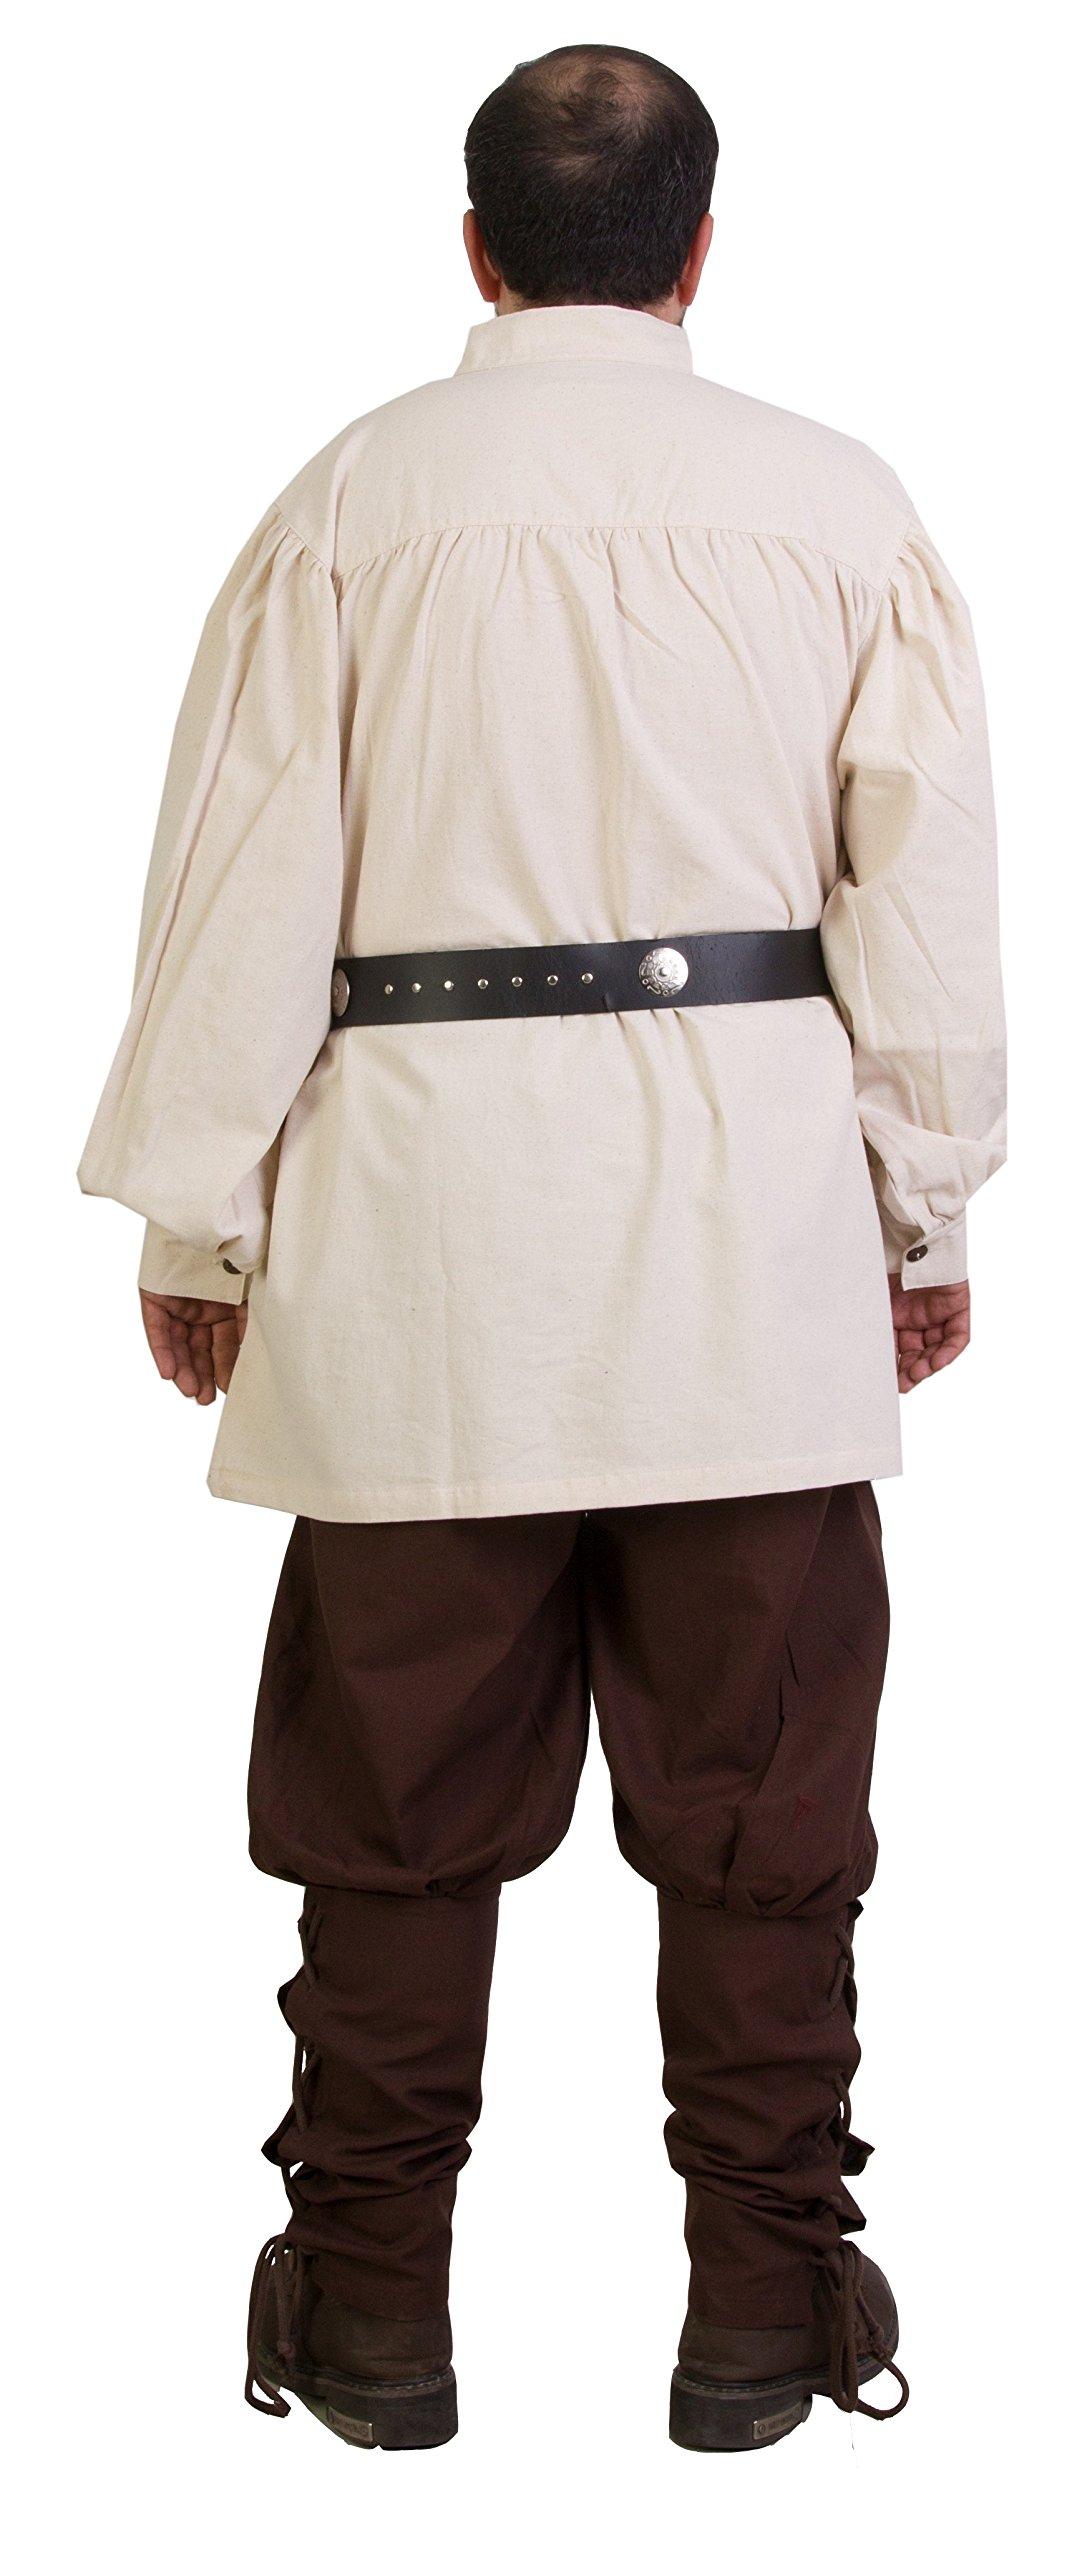 byCalvina - Calvina Costumes ERMES Medieval Viking LARP Pirate Cotton Man Shirt - Made in Turkey-Nat-2XL by byCalvina - Calvina Costumes (Image #7)